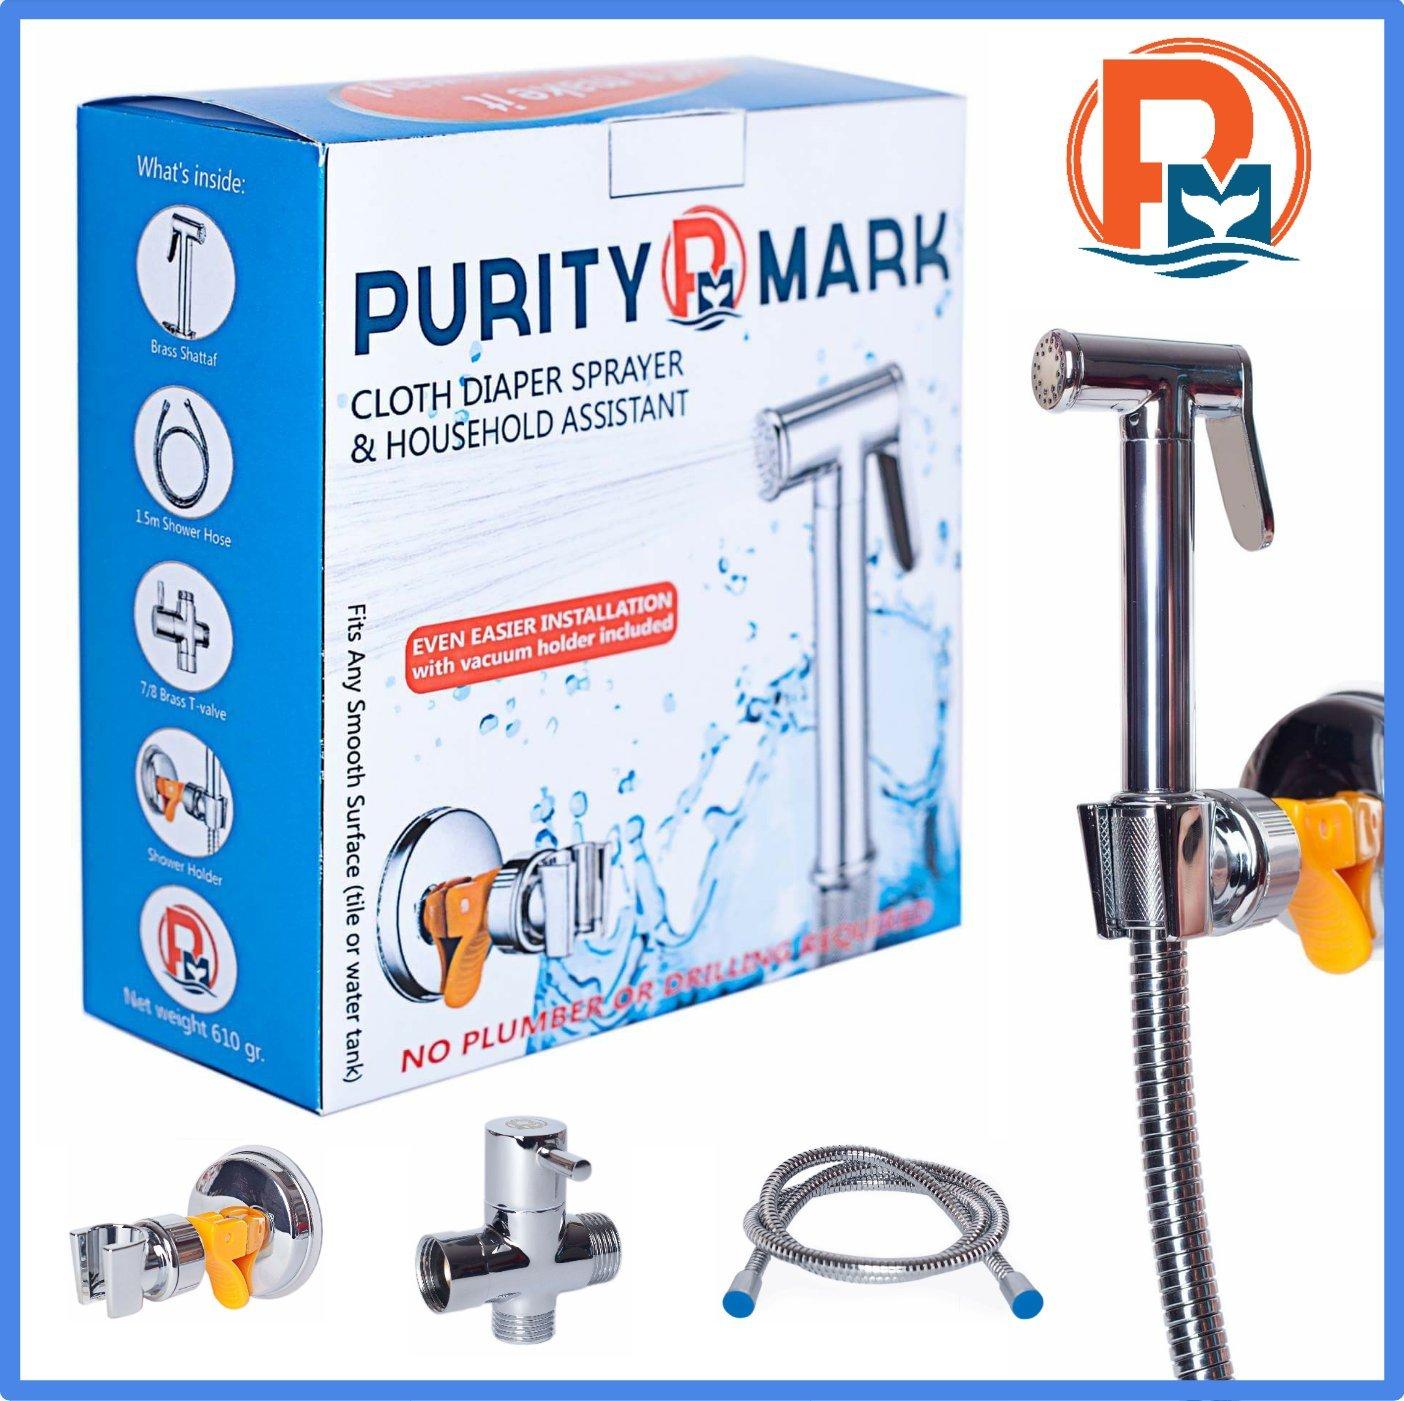 Amazon.com : Purity Mark Cloth Diaper Sprayer - a Premium Personal ...